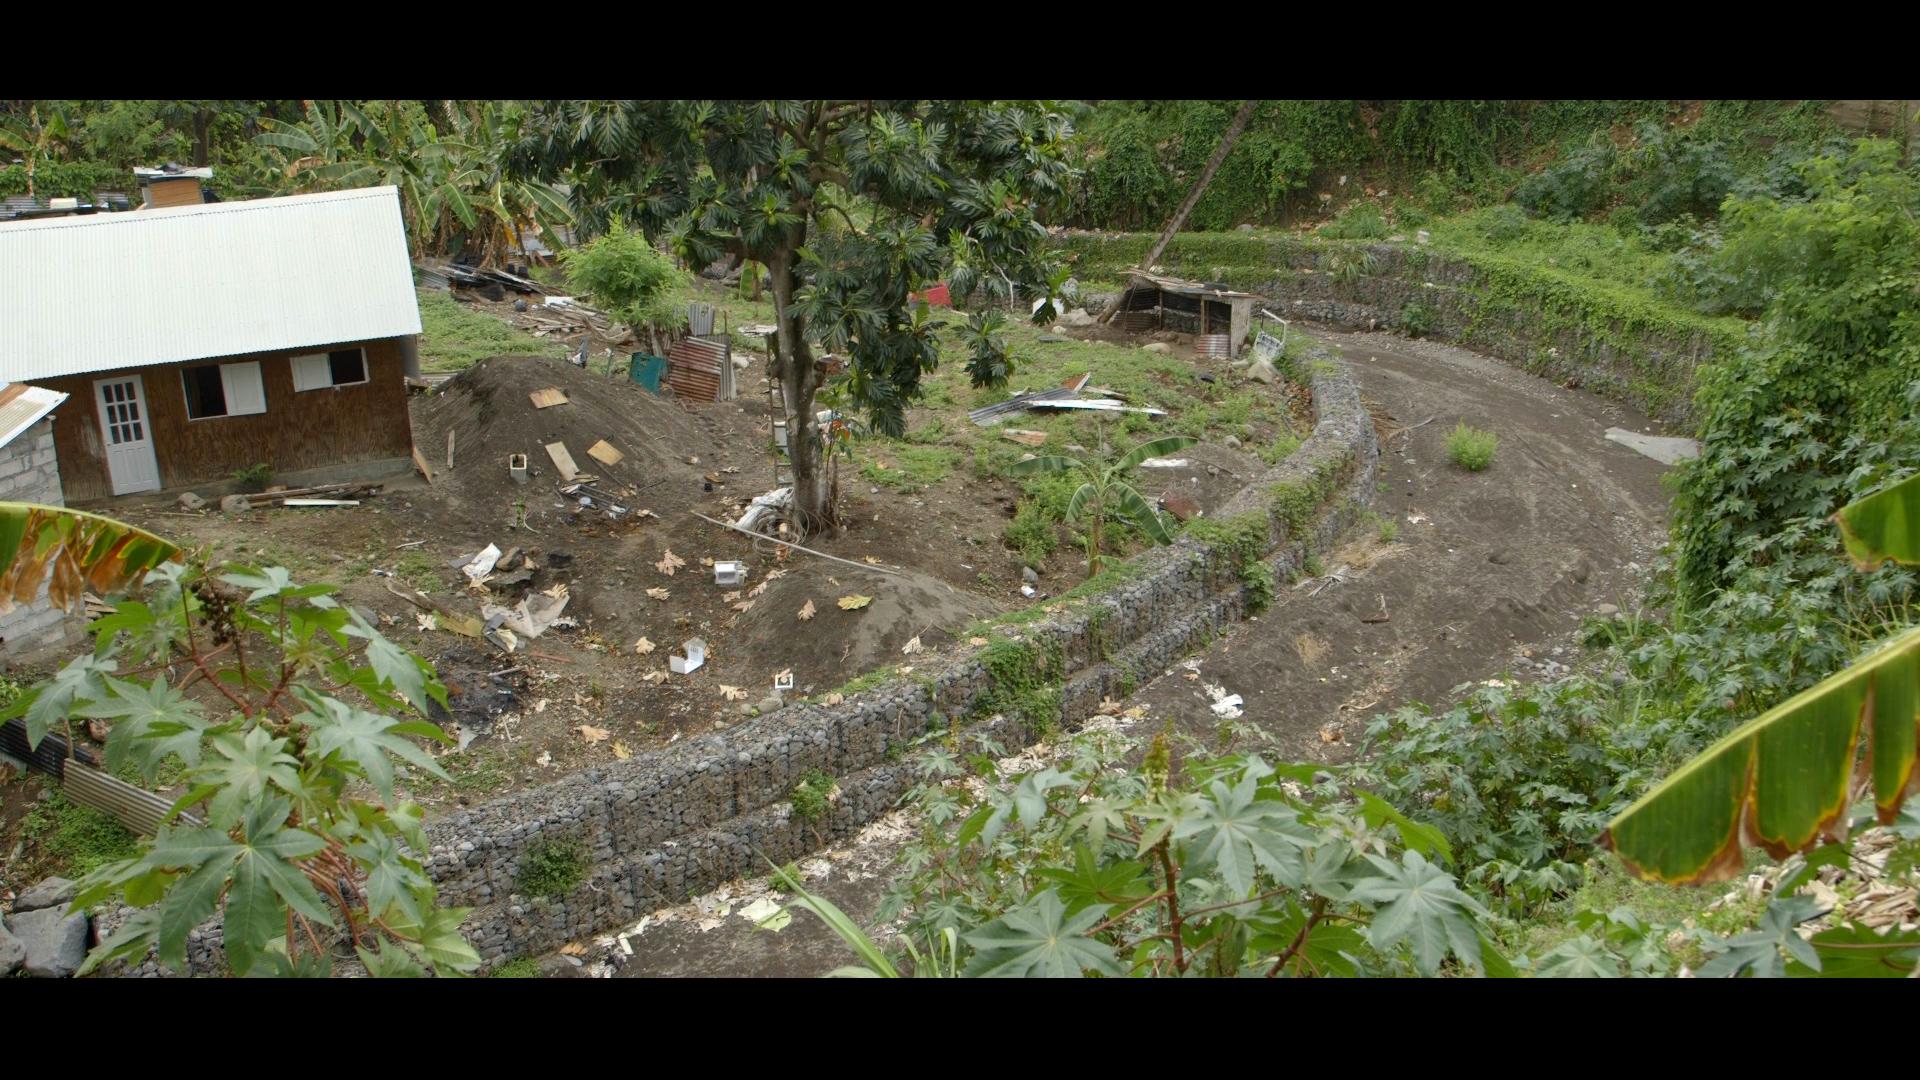 Gabion baskets along the stream slopes